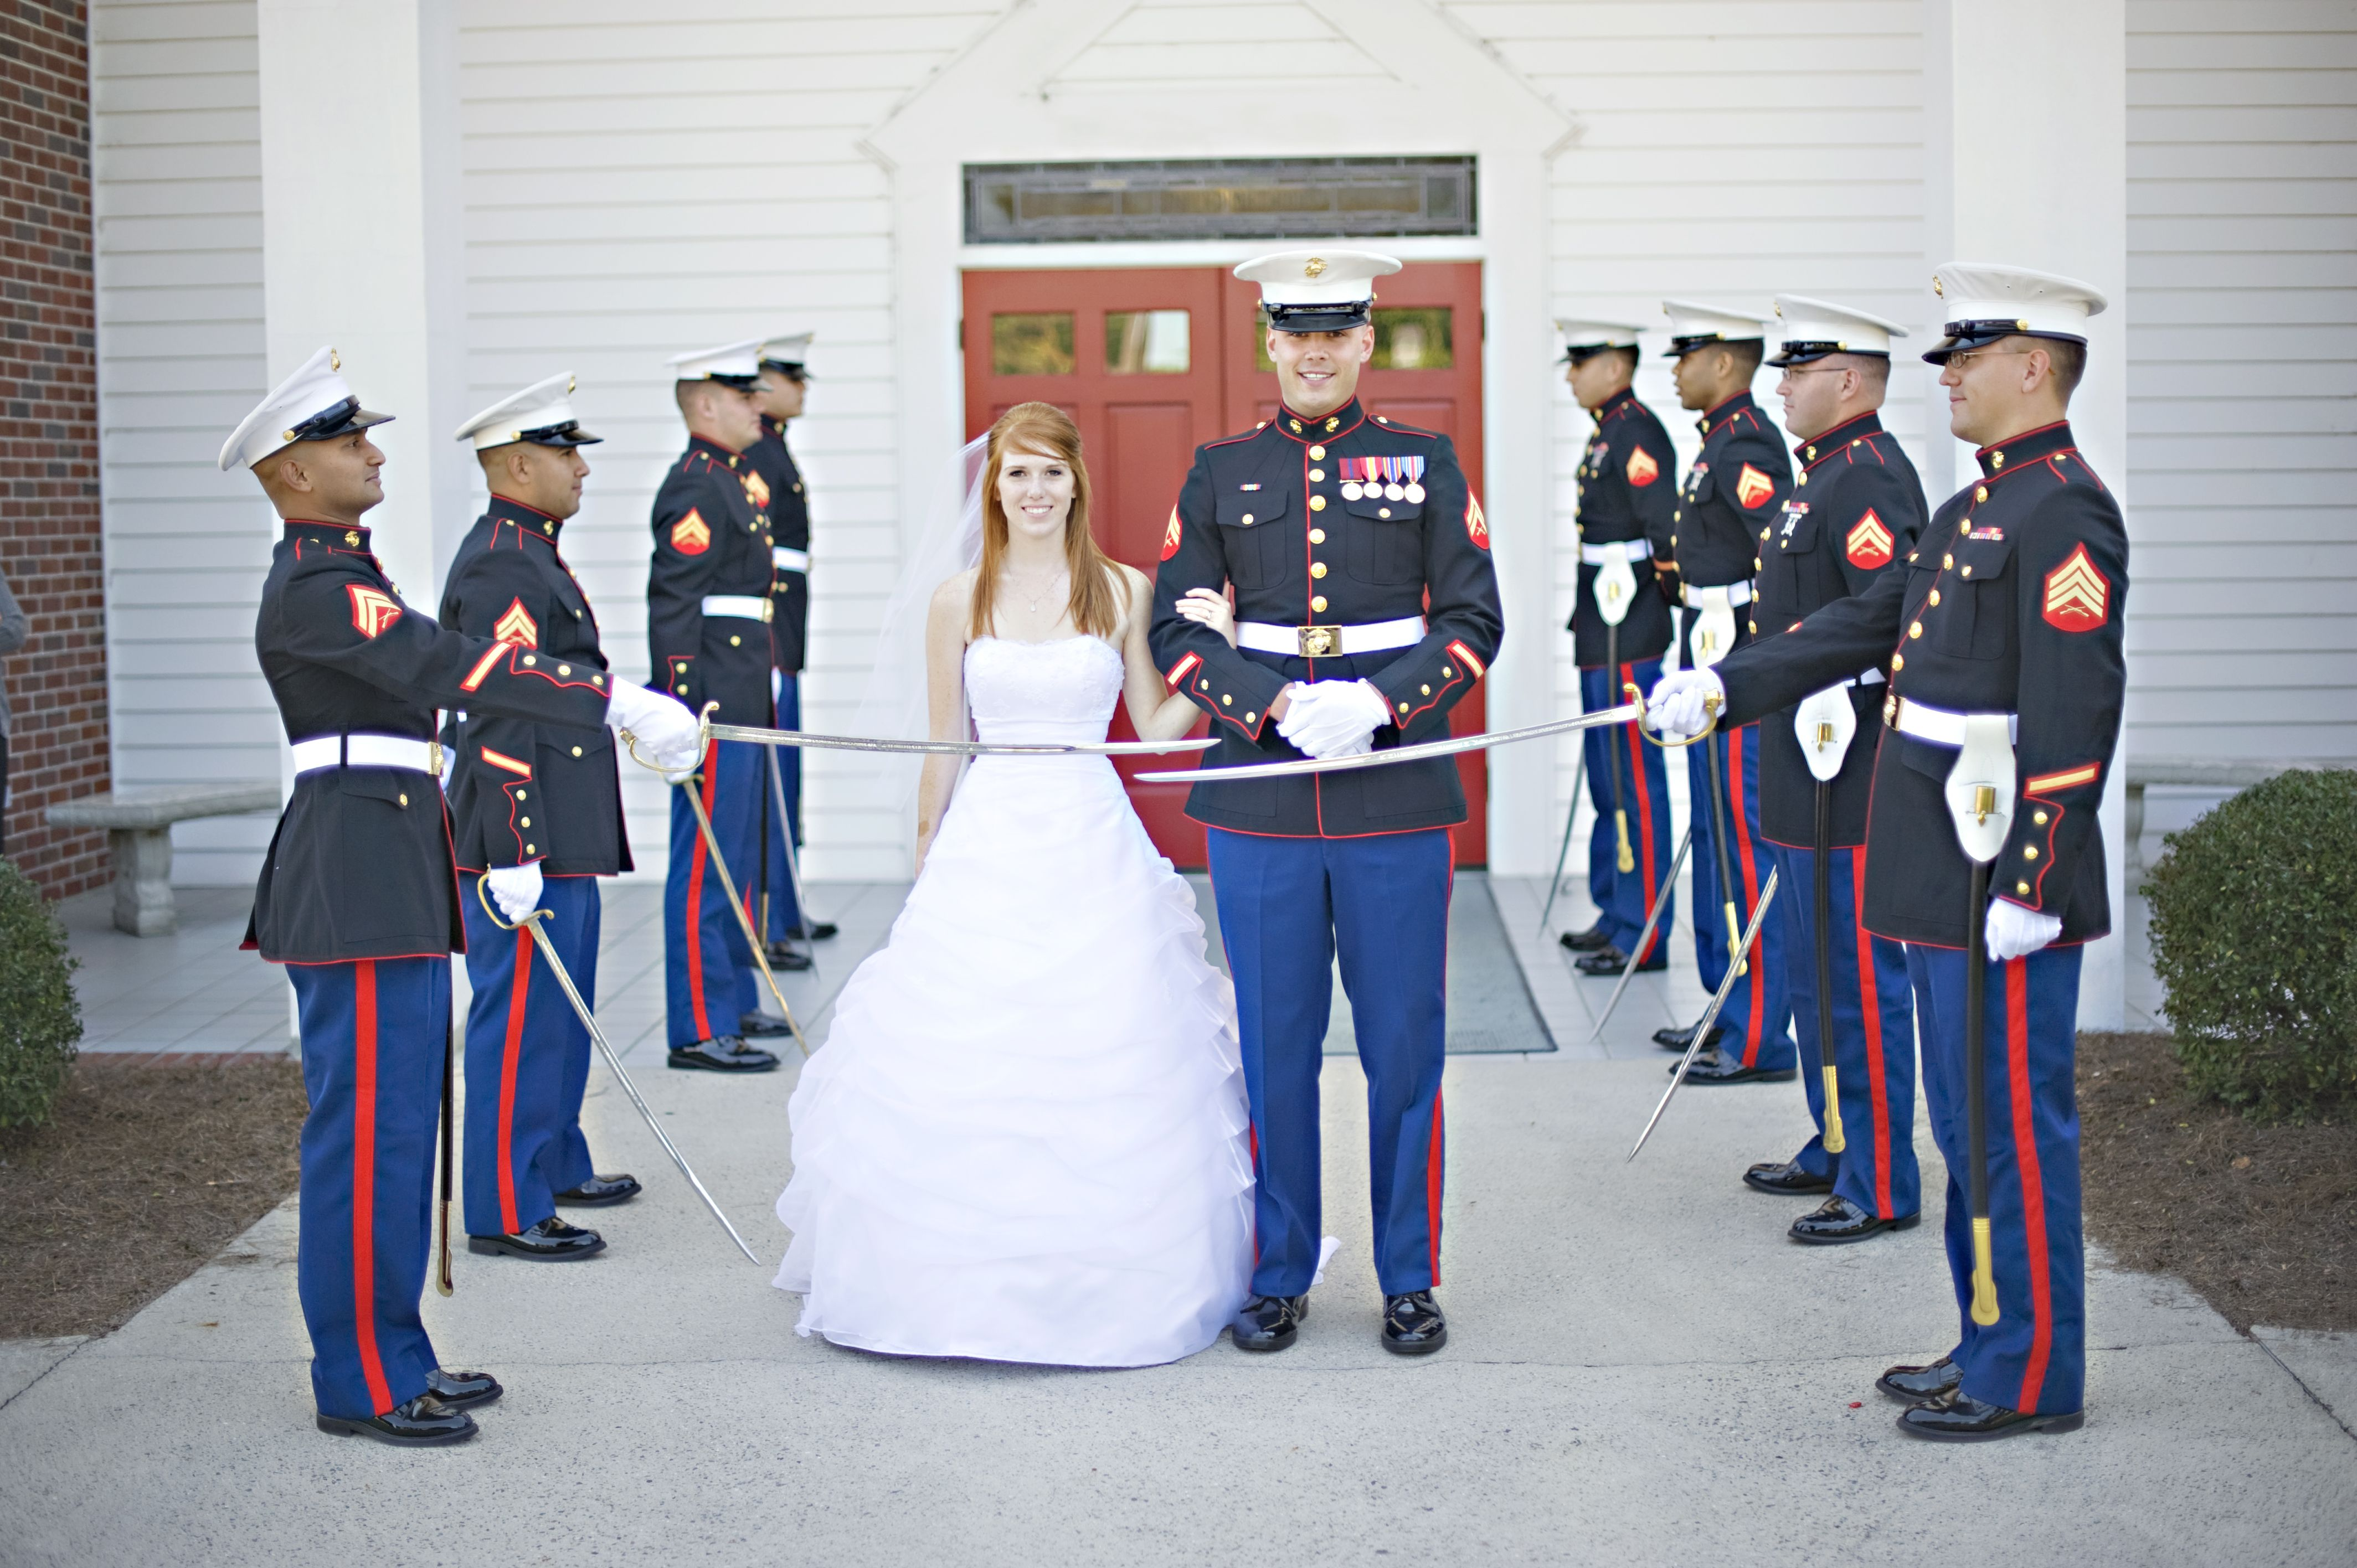 Marine Sword Ceremony Usmc Wedding Usmc Wedding Marine Wedding Dress Images